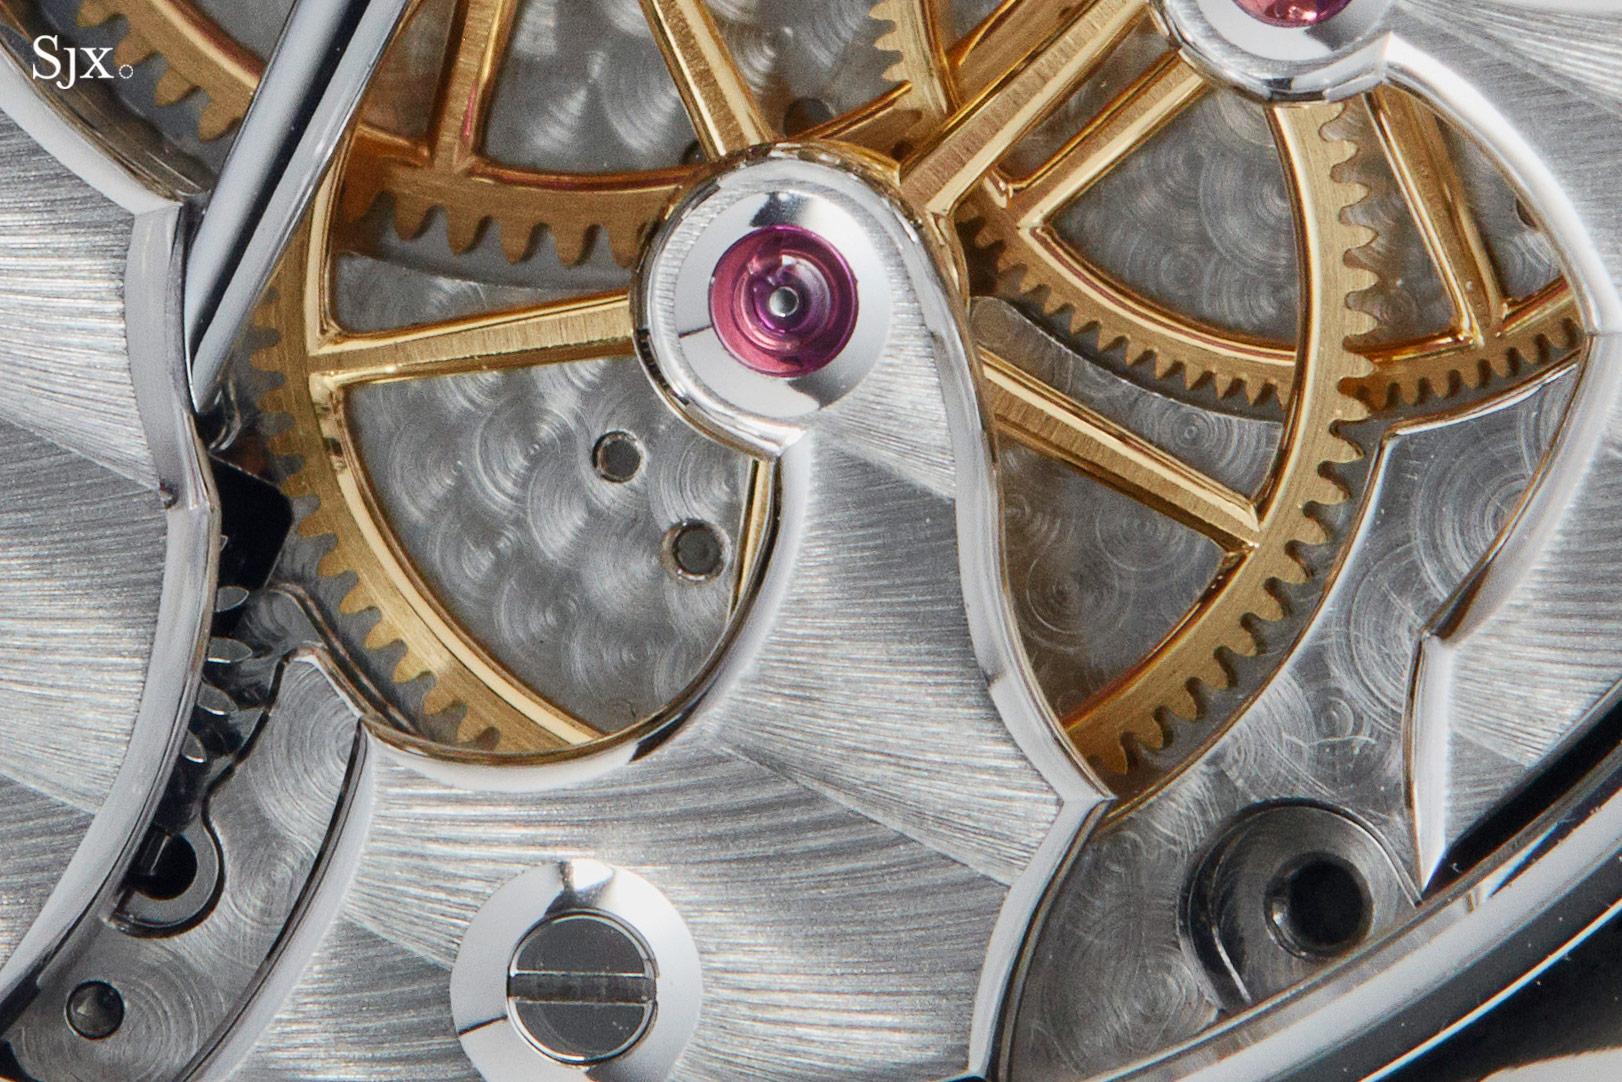 Akrivia Chronometre Contemporain Rexhep Rexhepi 4